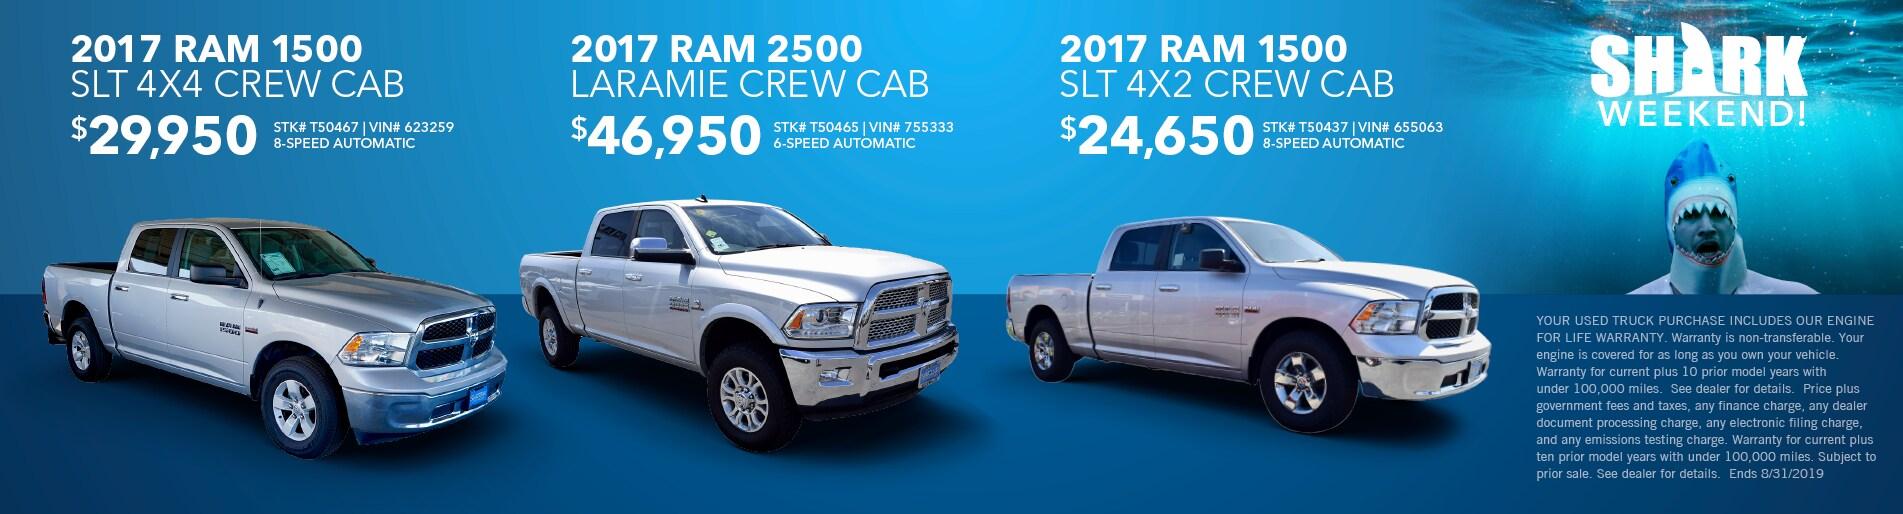 Clawson Truck Center | Used Car Dealer | Clovis & Fresno, CA